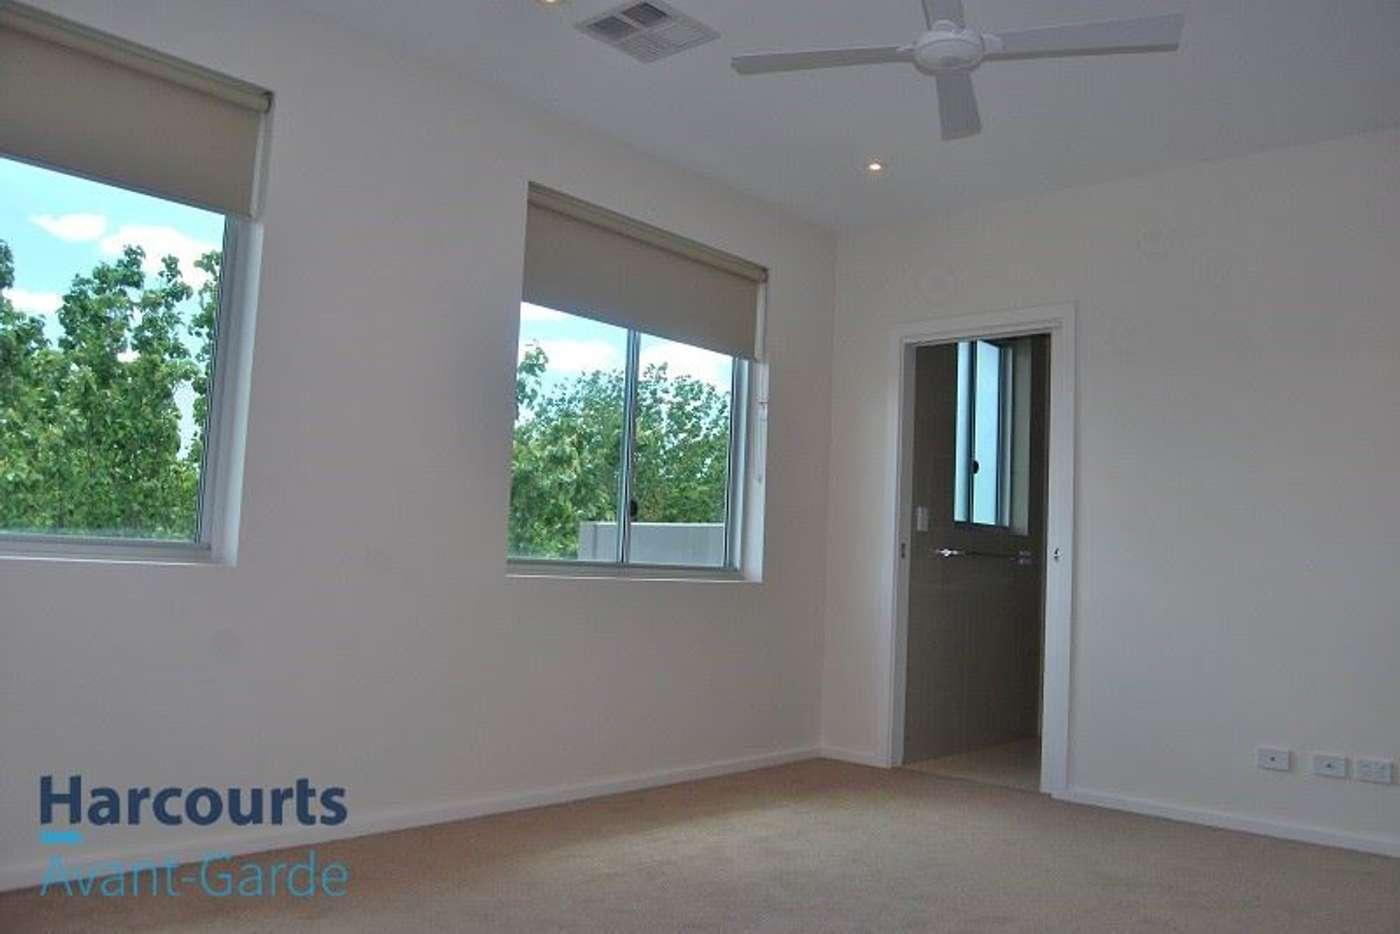 Seventh view of Homely townhouse listing, 191 Mawson Lakes Blvd, Mawson Lakes SA 5095